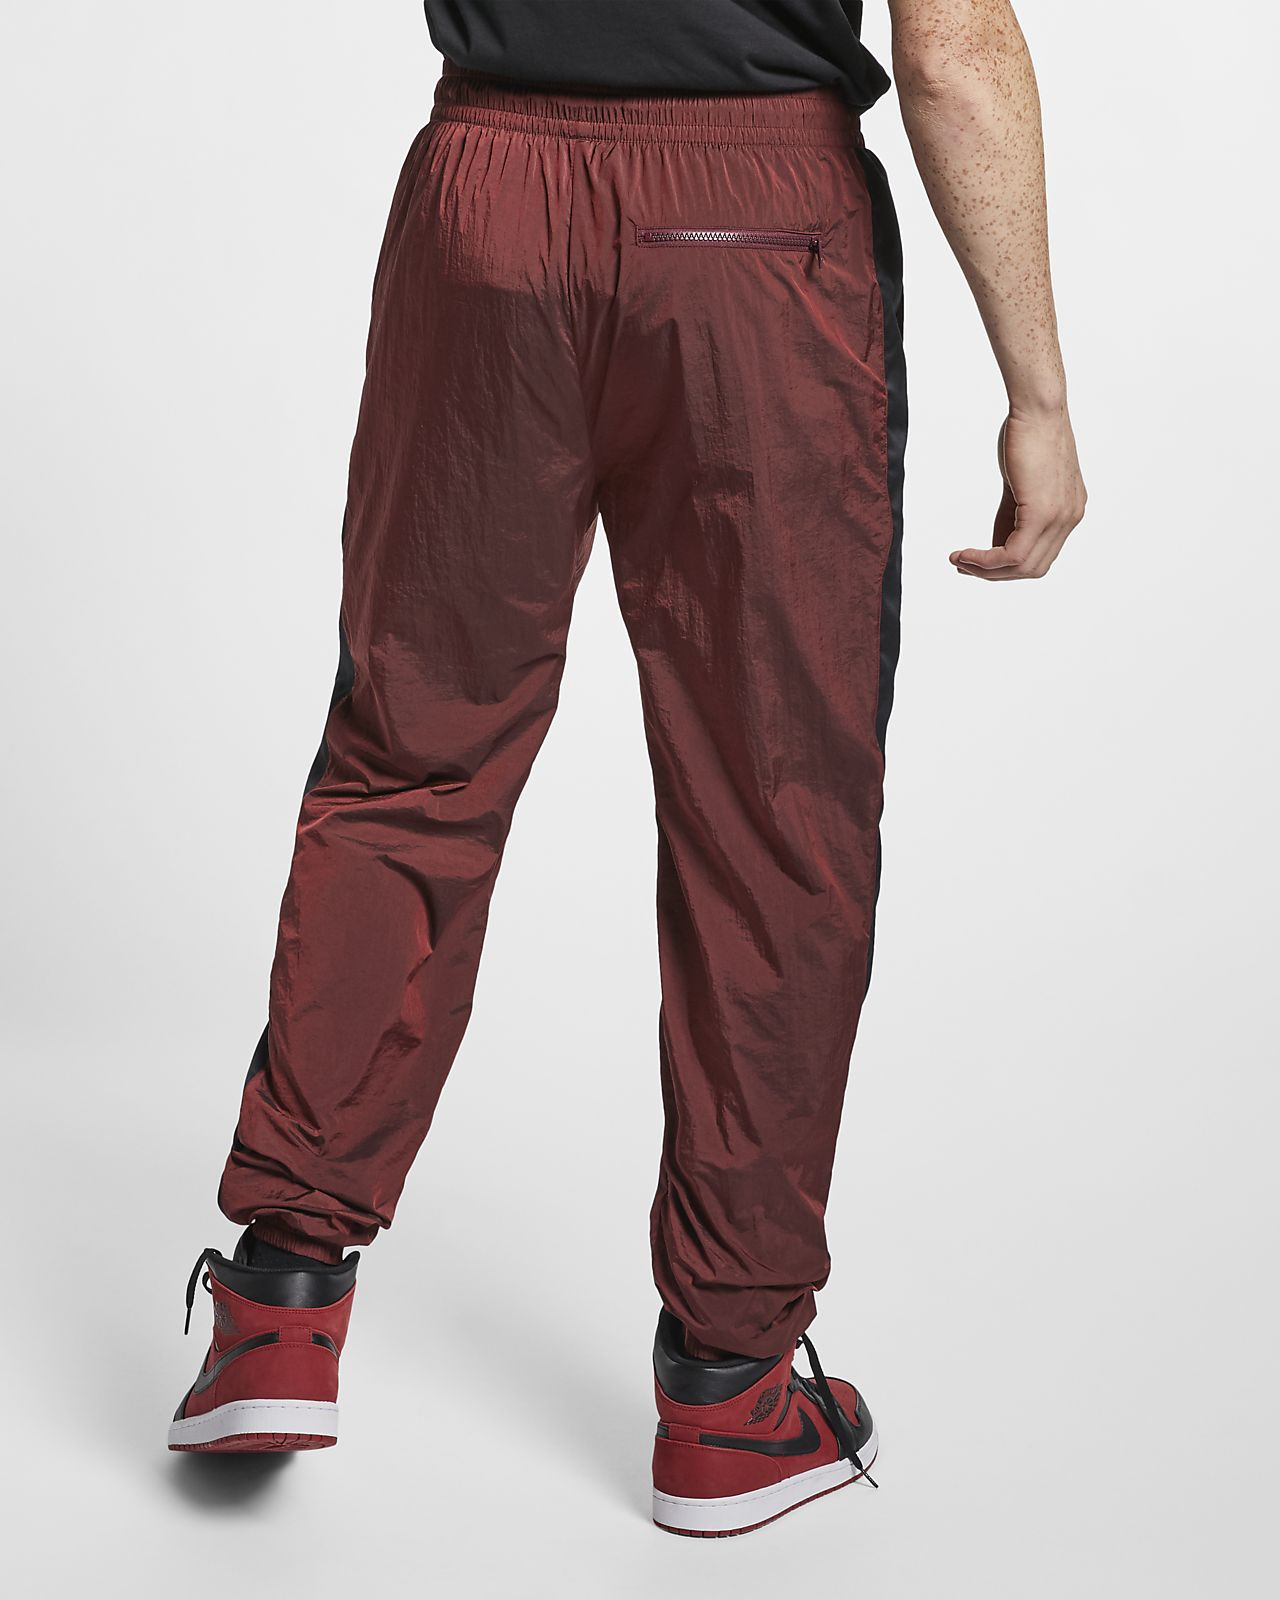 Pantalon de survêtement Jordan Flight